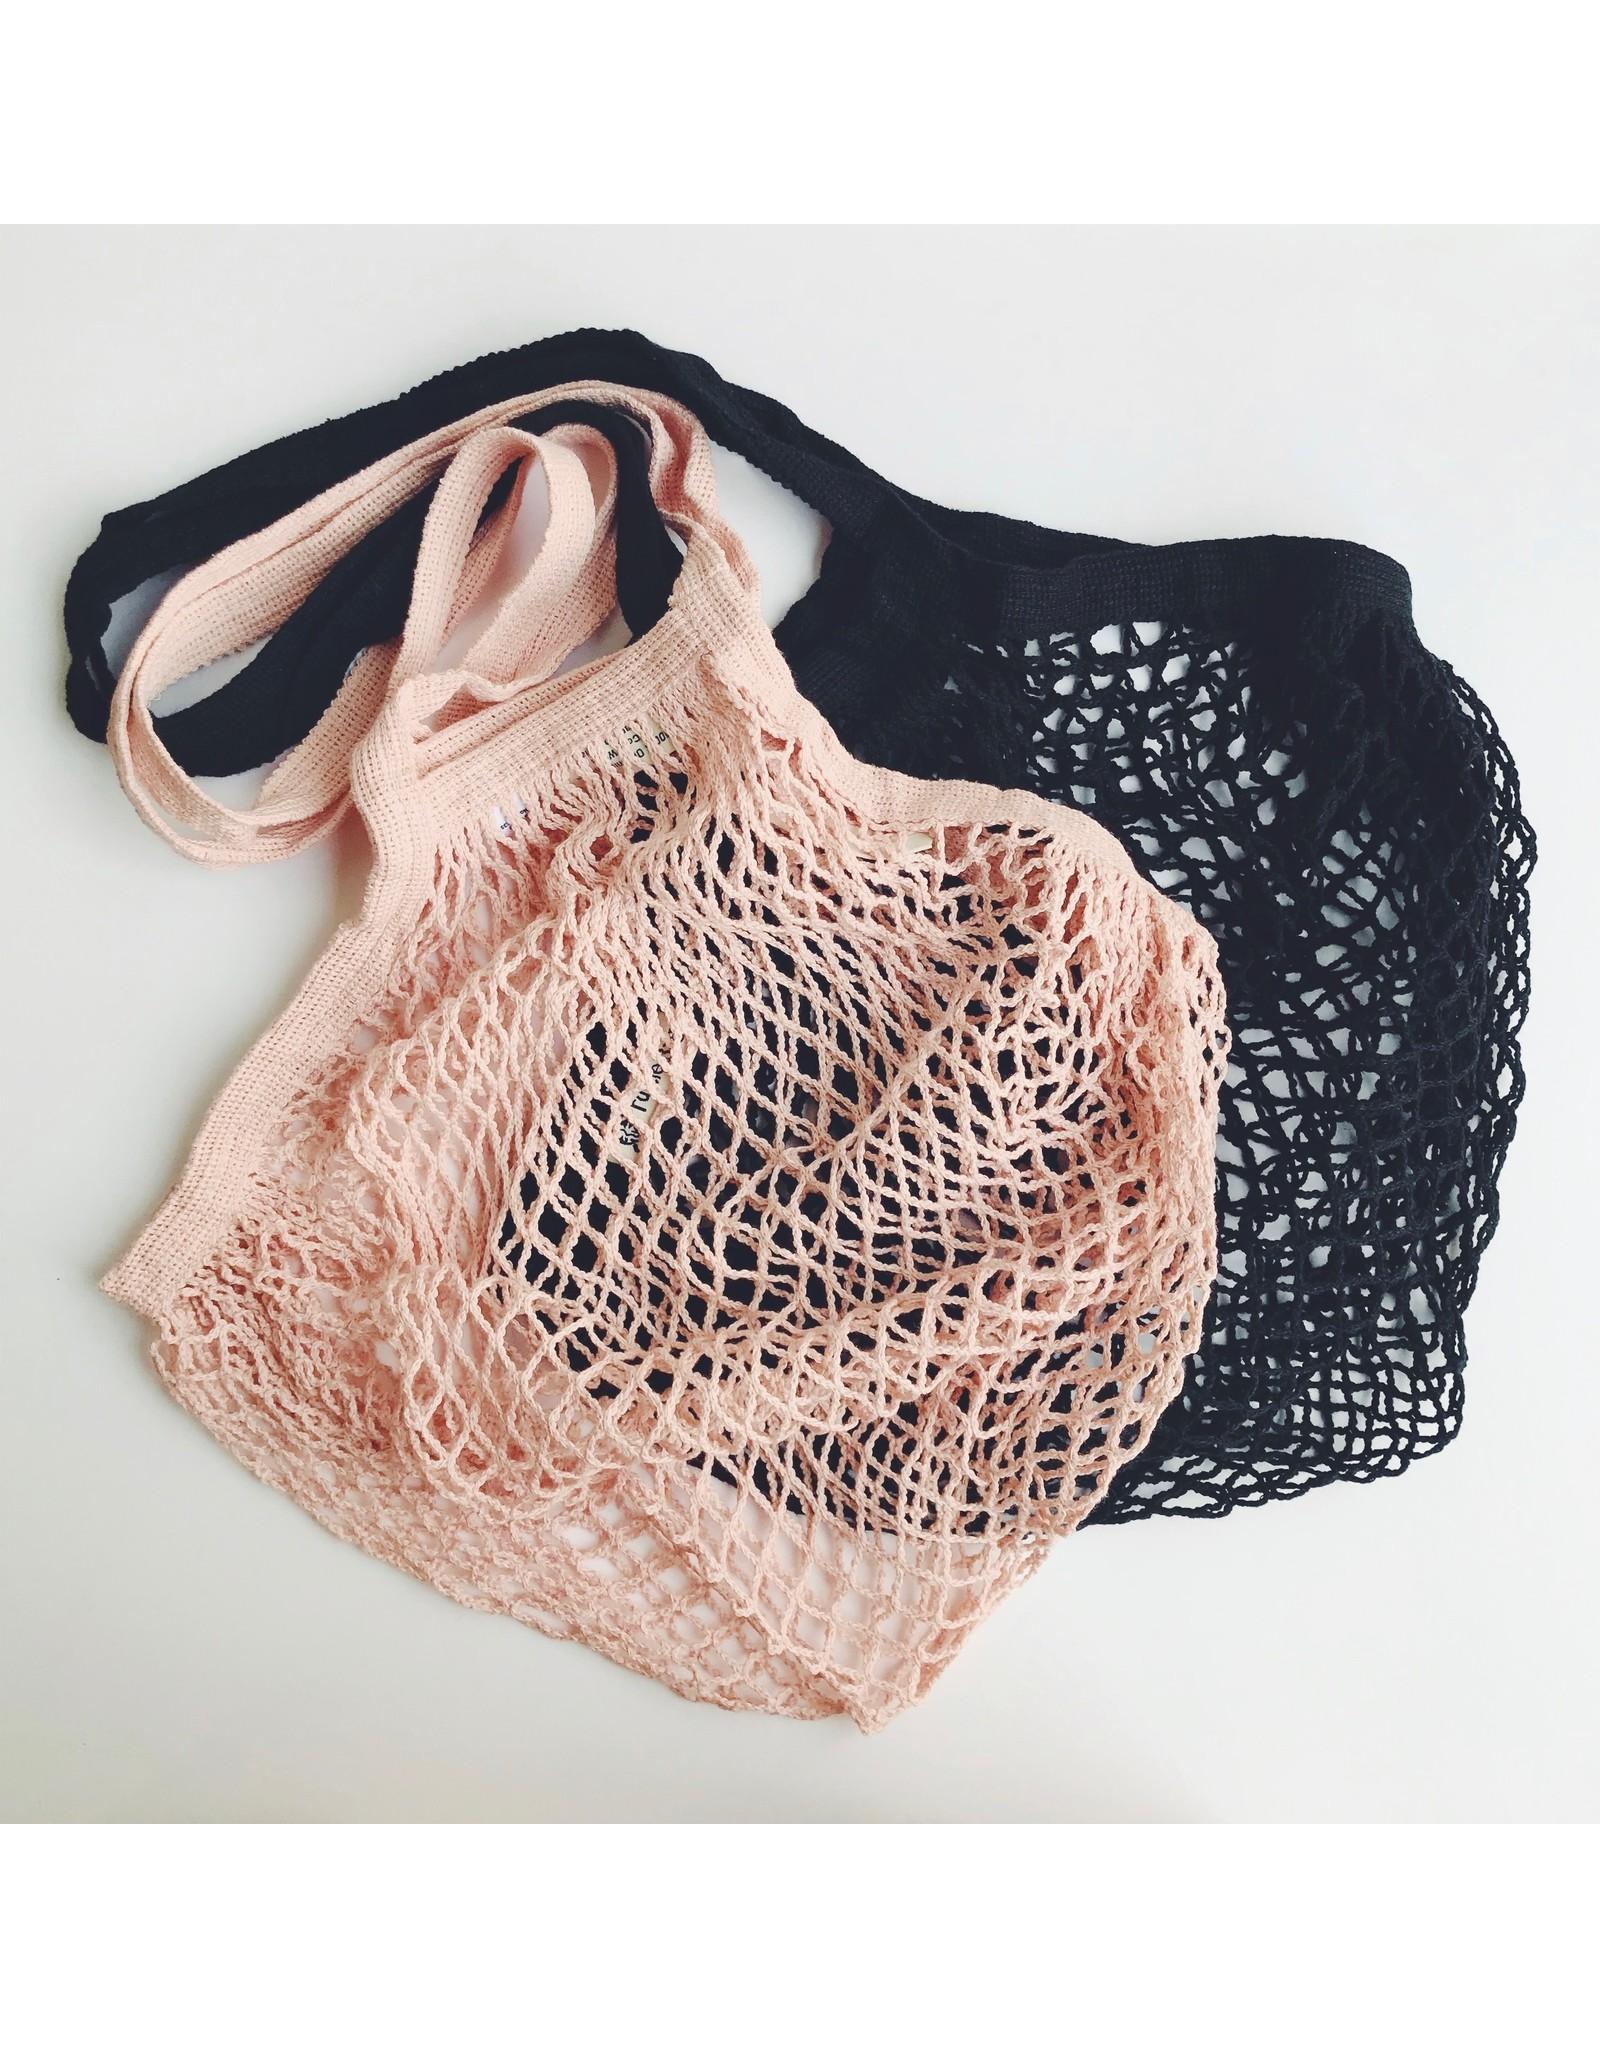 String Bag Long Handles